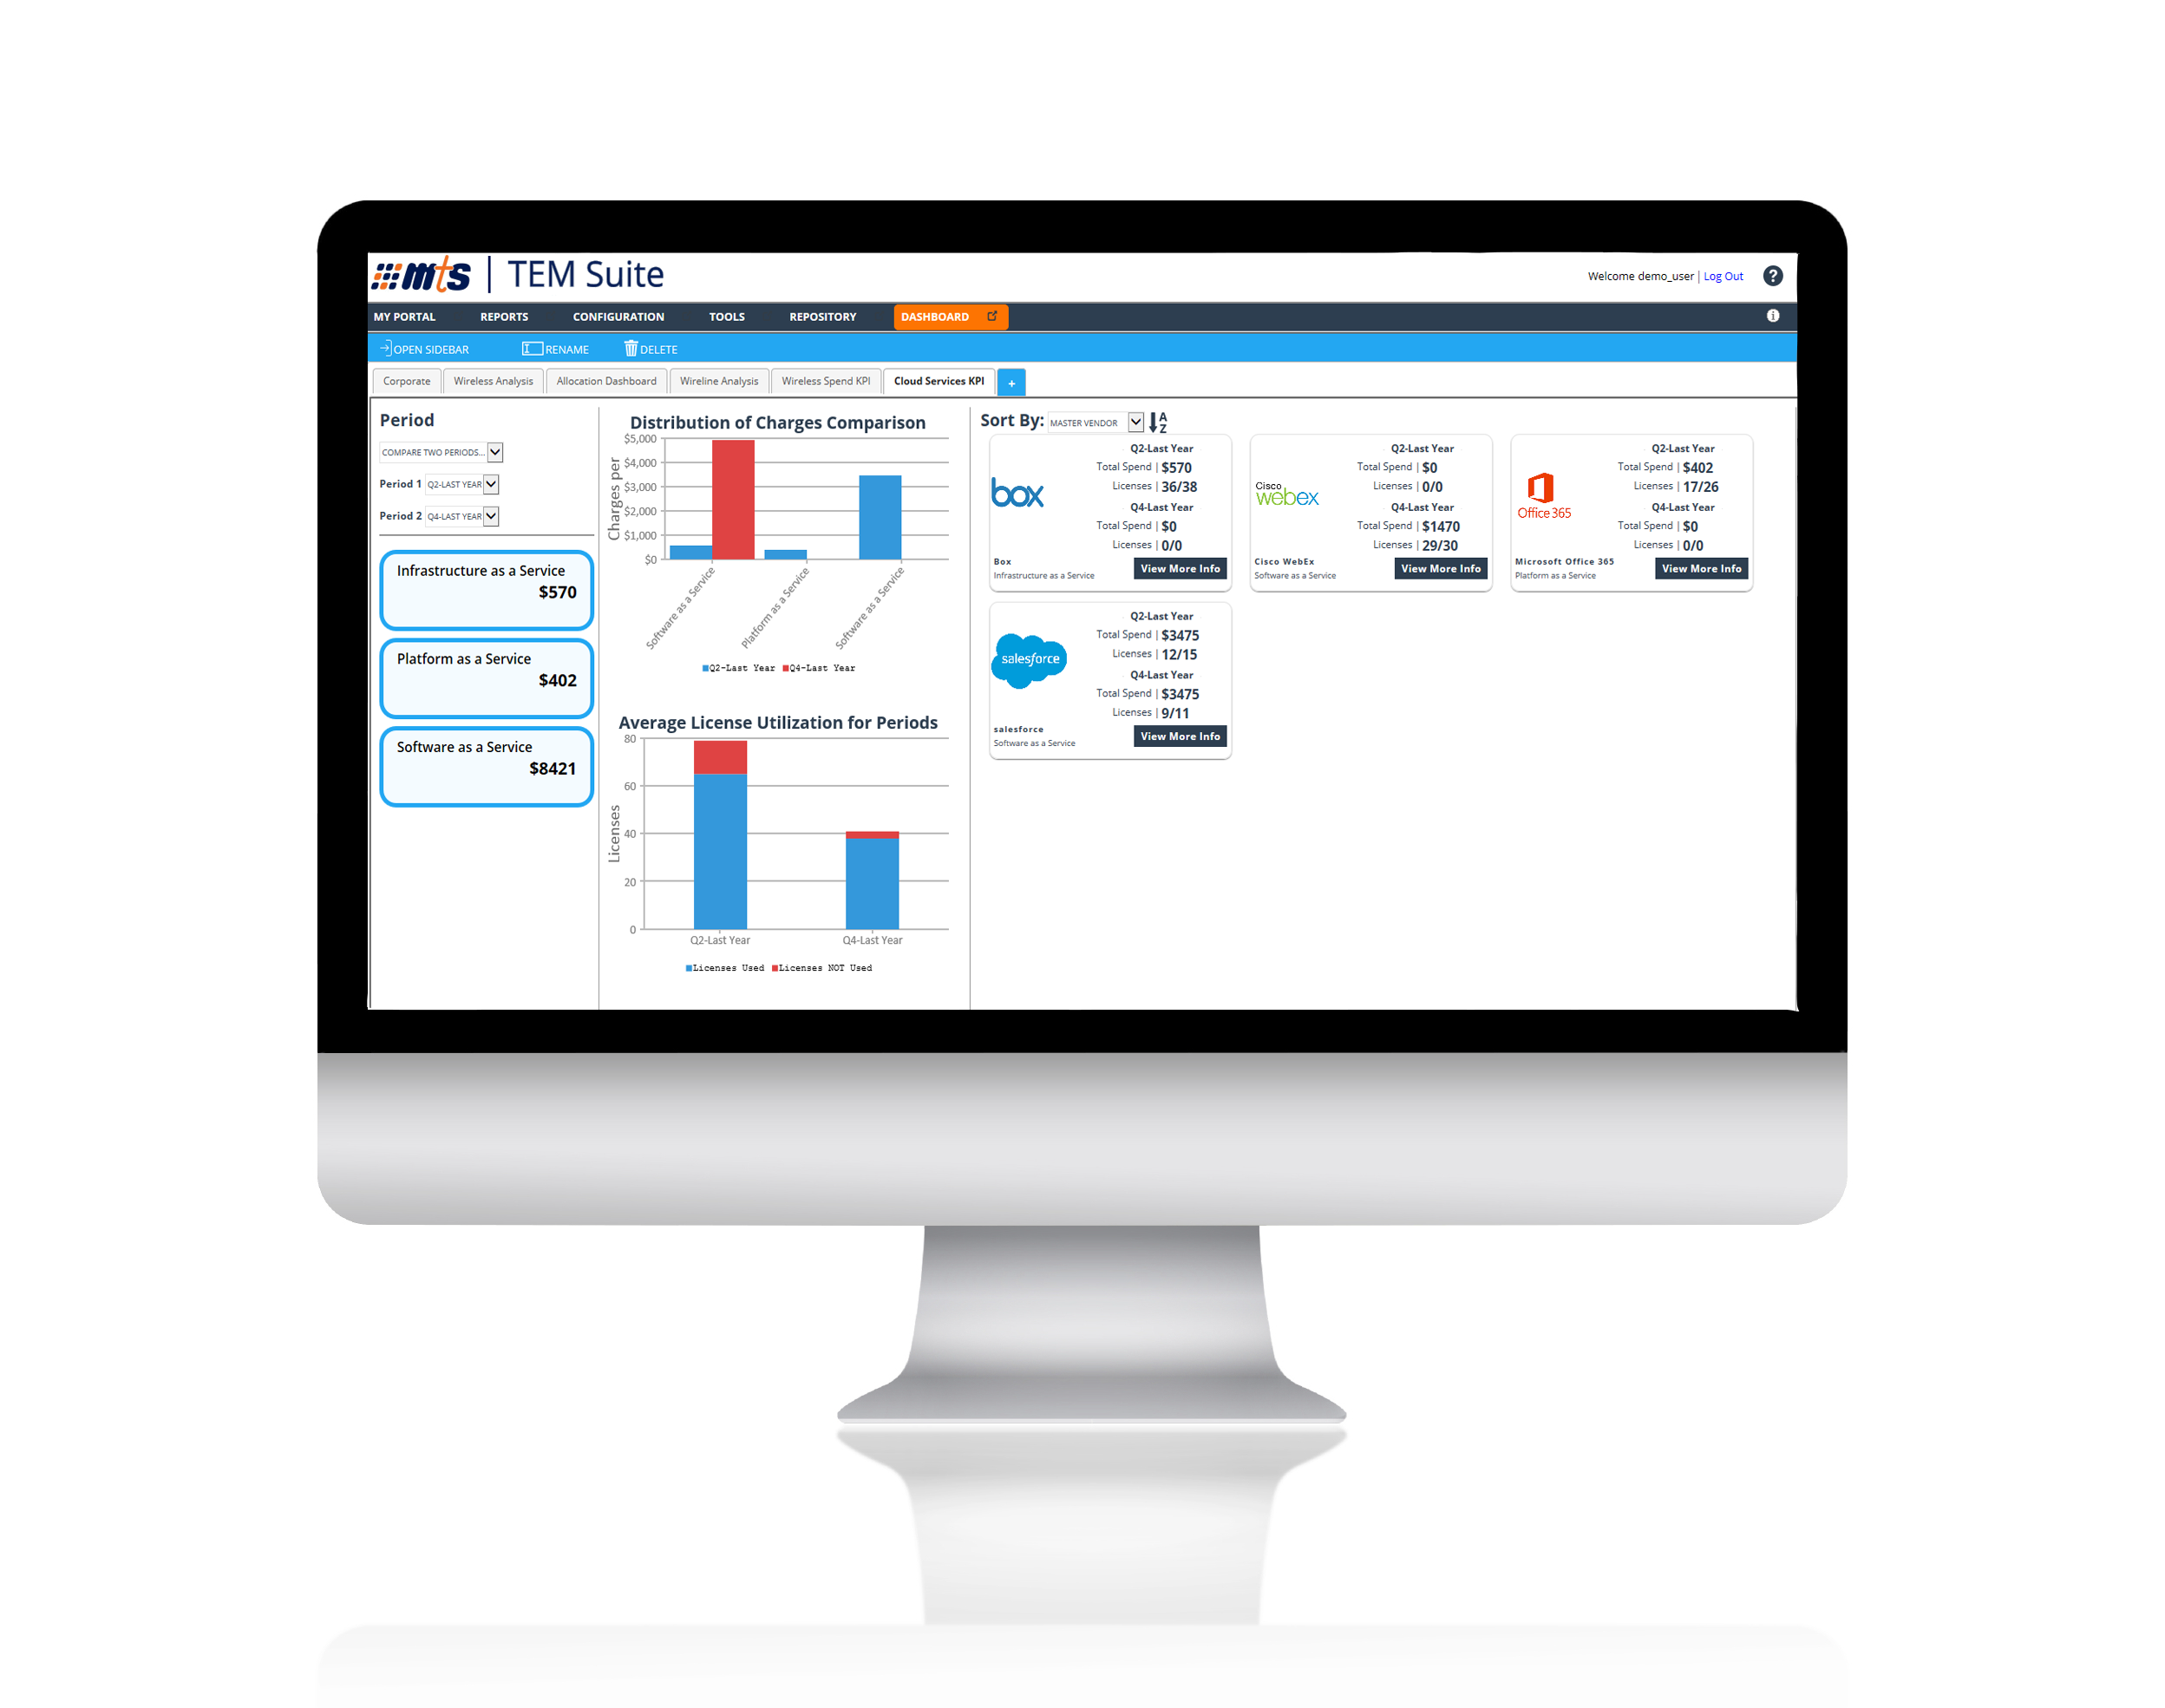 Cloud Service Management optimizes cloud service costs and manages seats and subscription plans